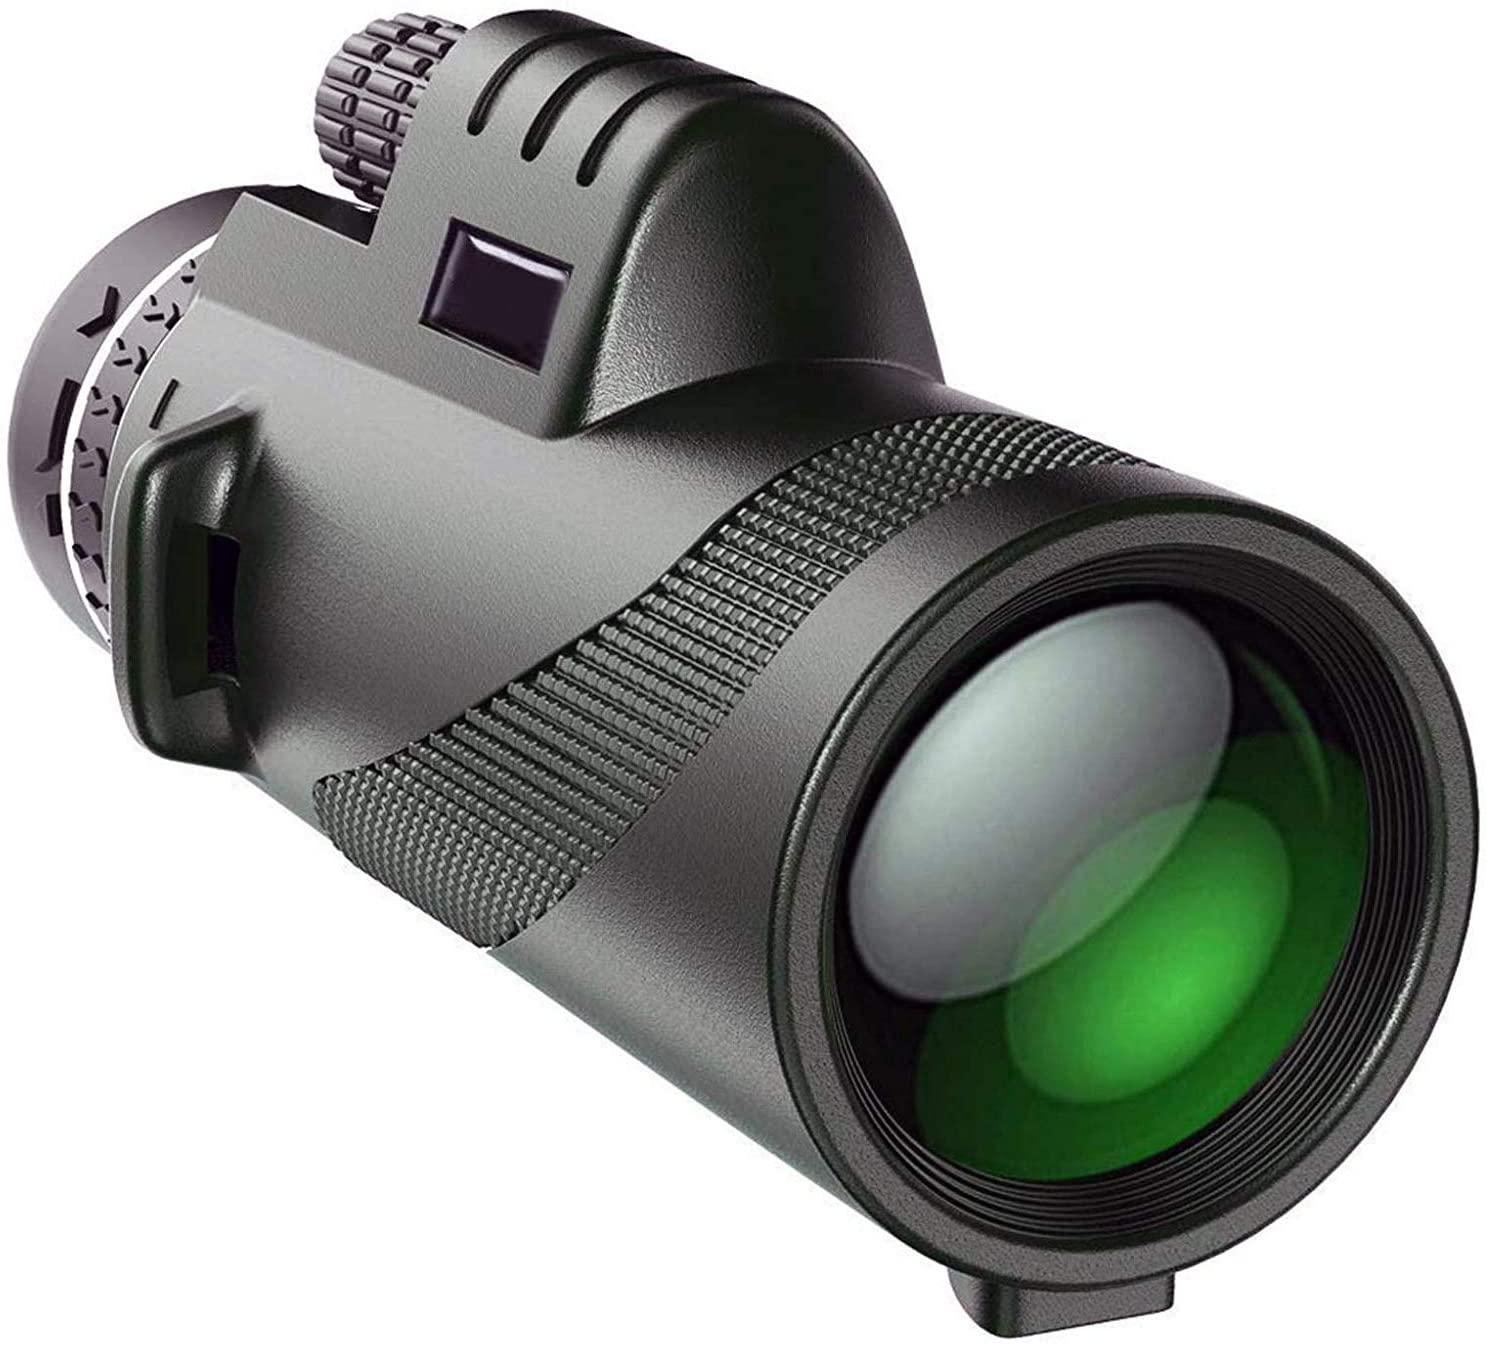 Duddy-cam KL-DC-45711-USA Duddy Cam Monocular Telescope - BAK4 Prism 12x50 High Power HD Vision - SingleHand Focus for Bird Watching, Hunting, Camping + 2 Tripods & Lanyard, Black